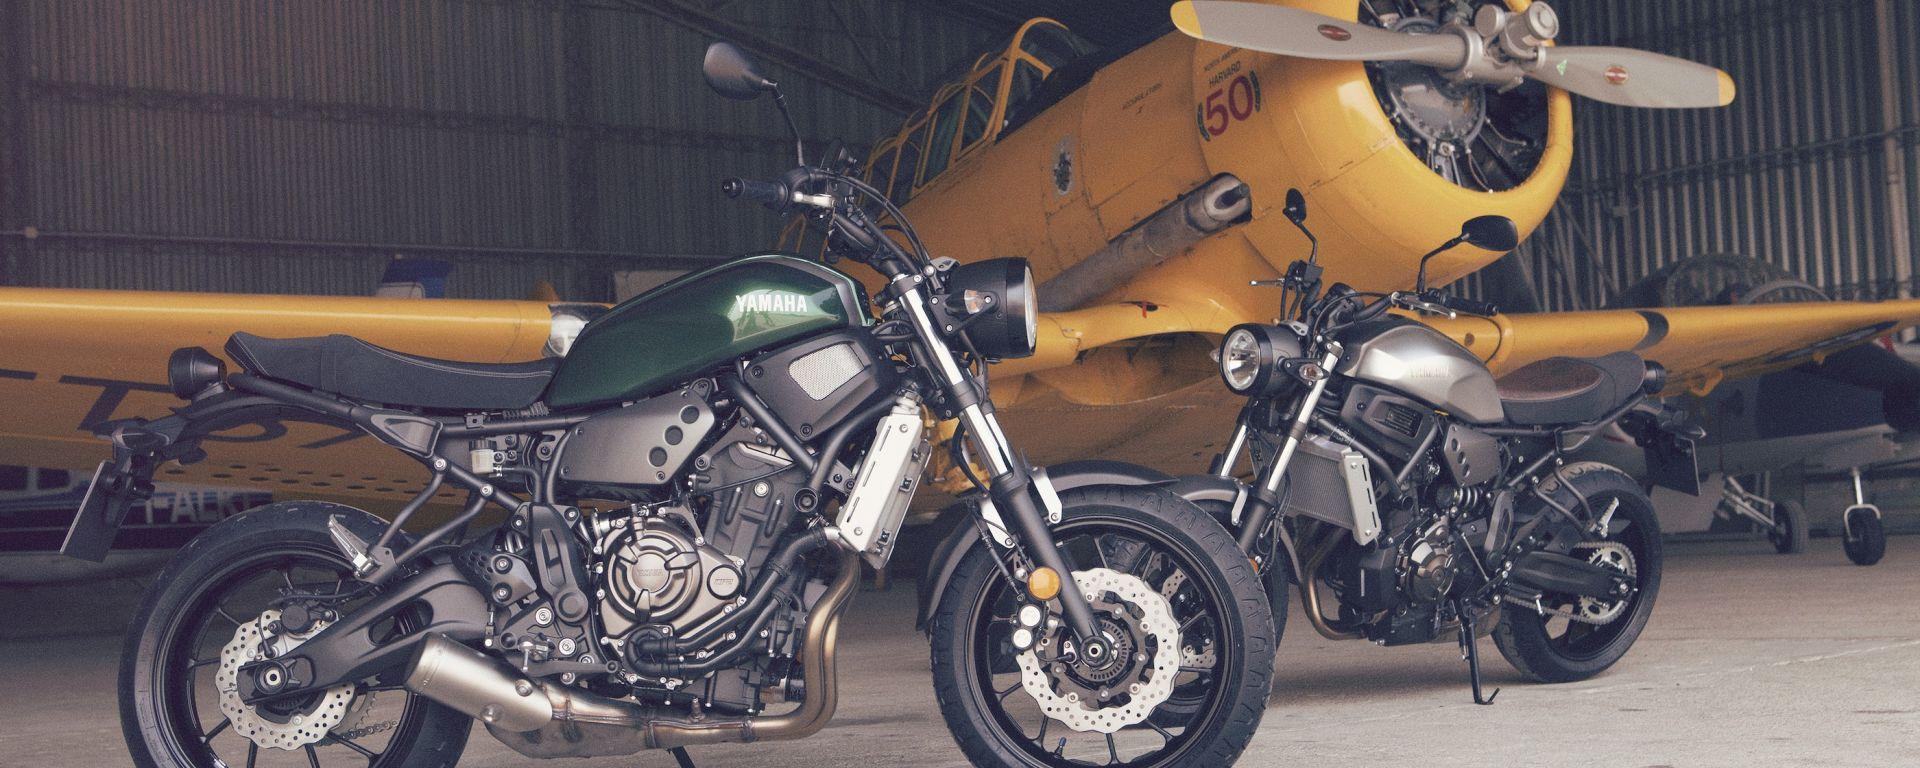 Yamaha XSR700 2016